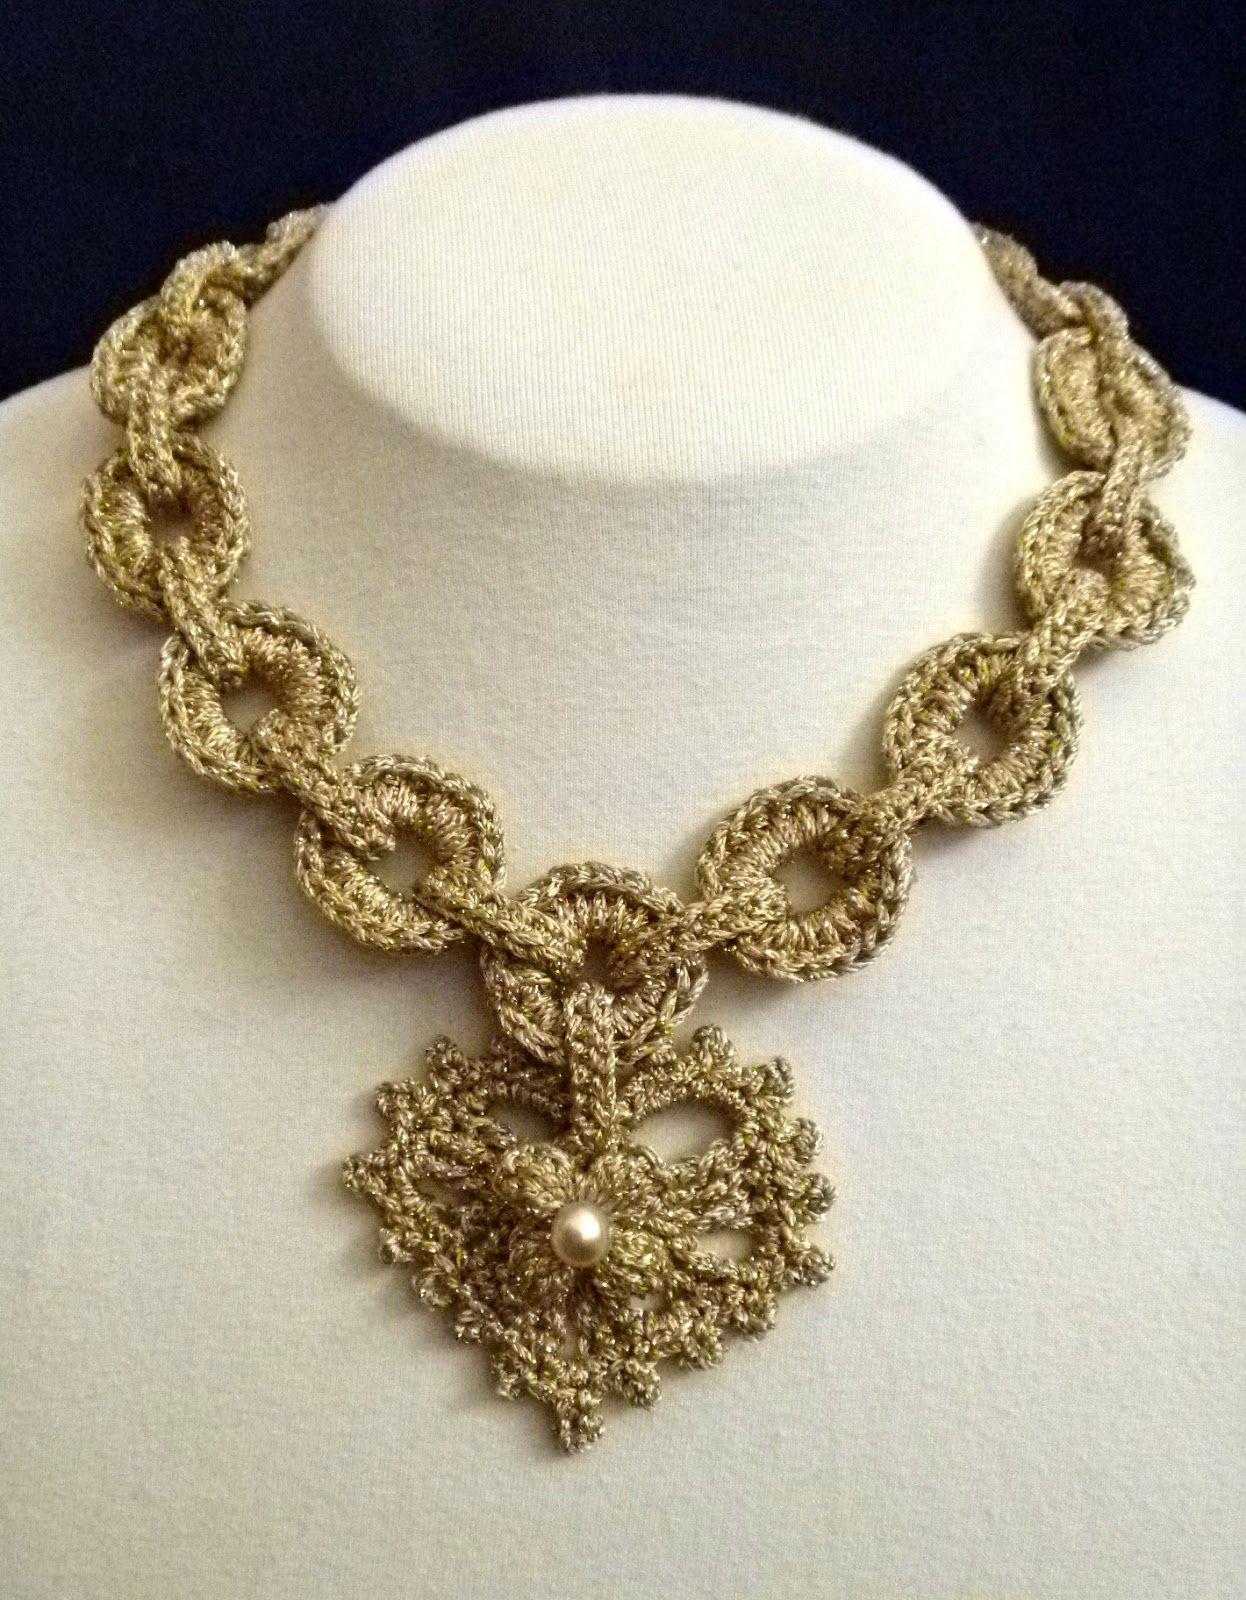 A New Use for the Charming Bracelet Pattern! | Crochet | Pinterest ...